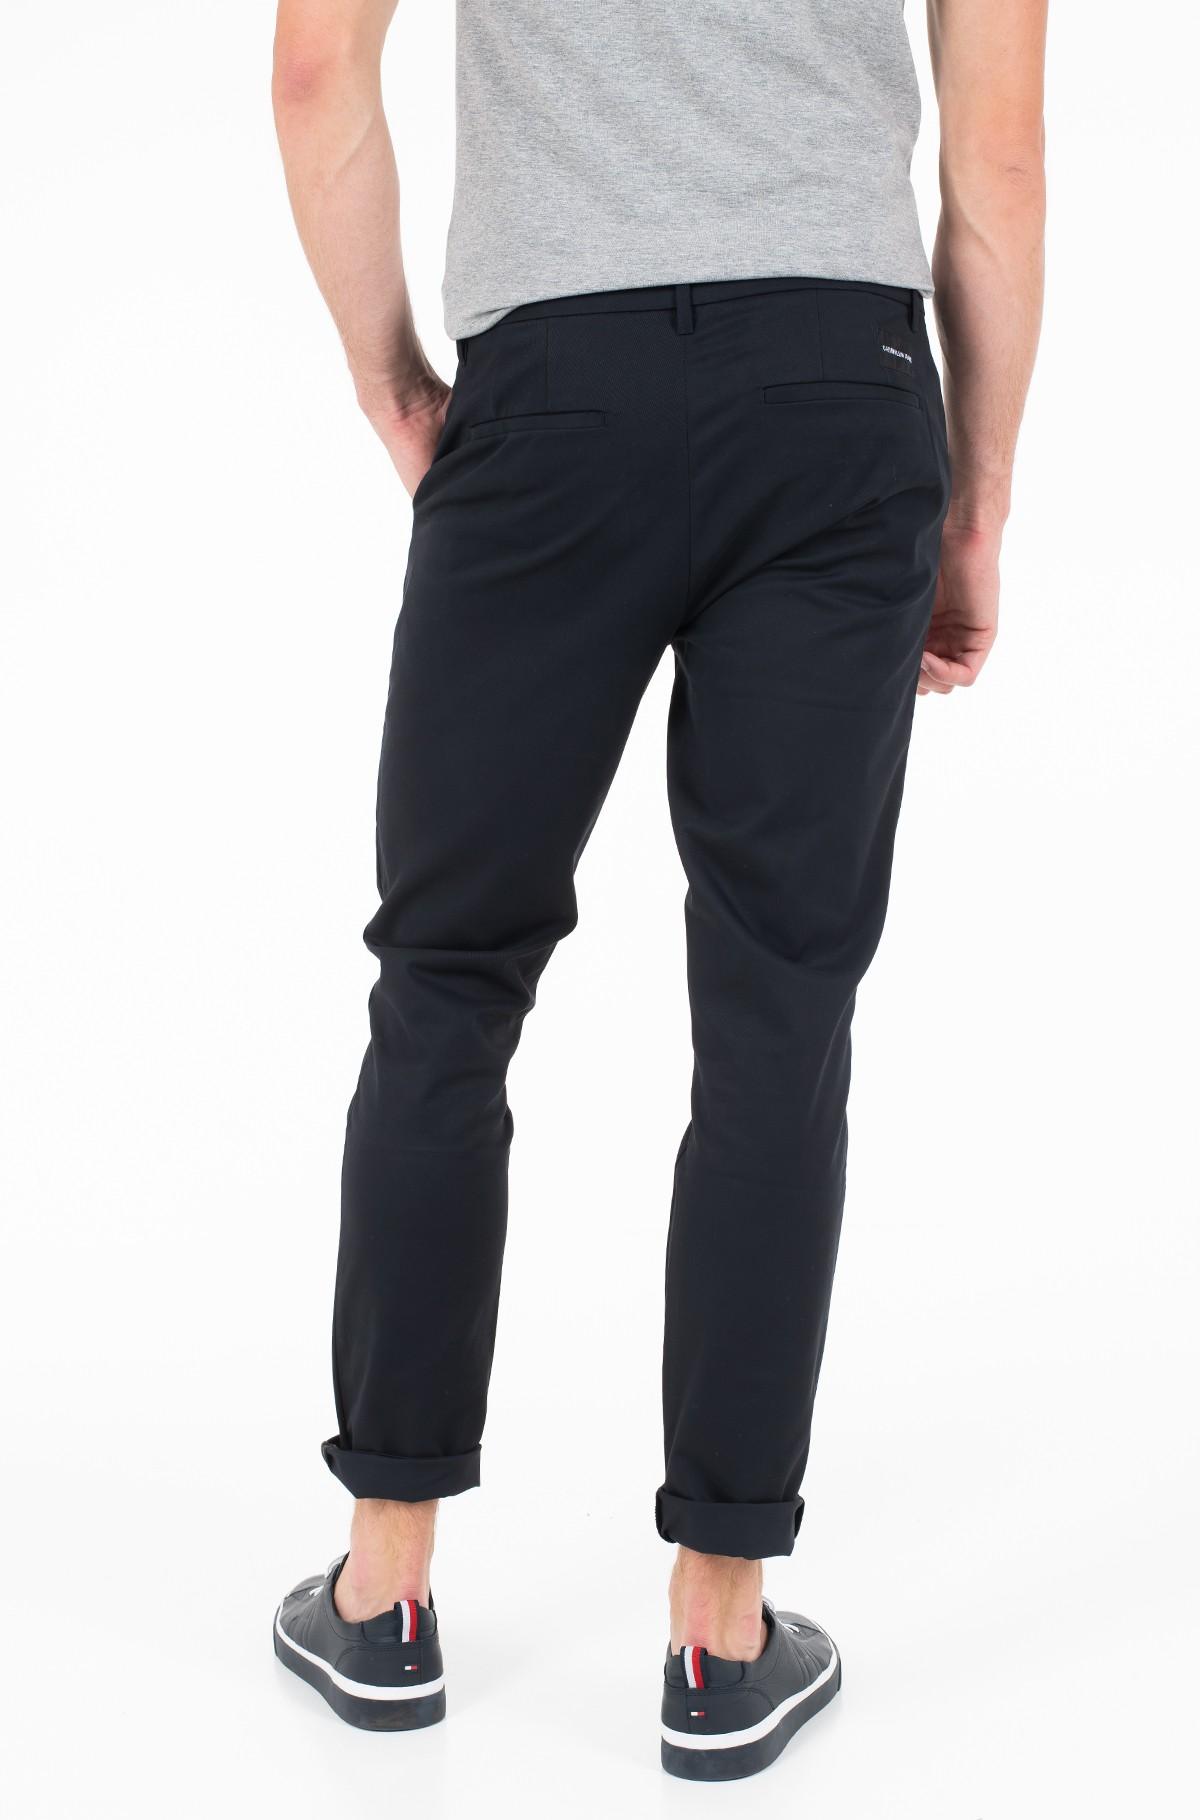 Kelnės CKJ026 SLIM STRETCH CHINO PANT-full-2